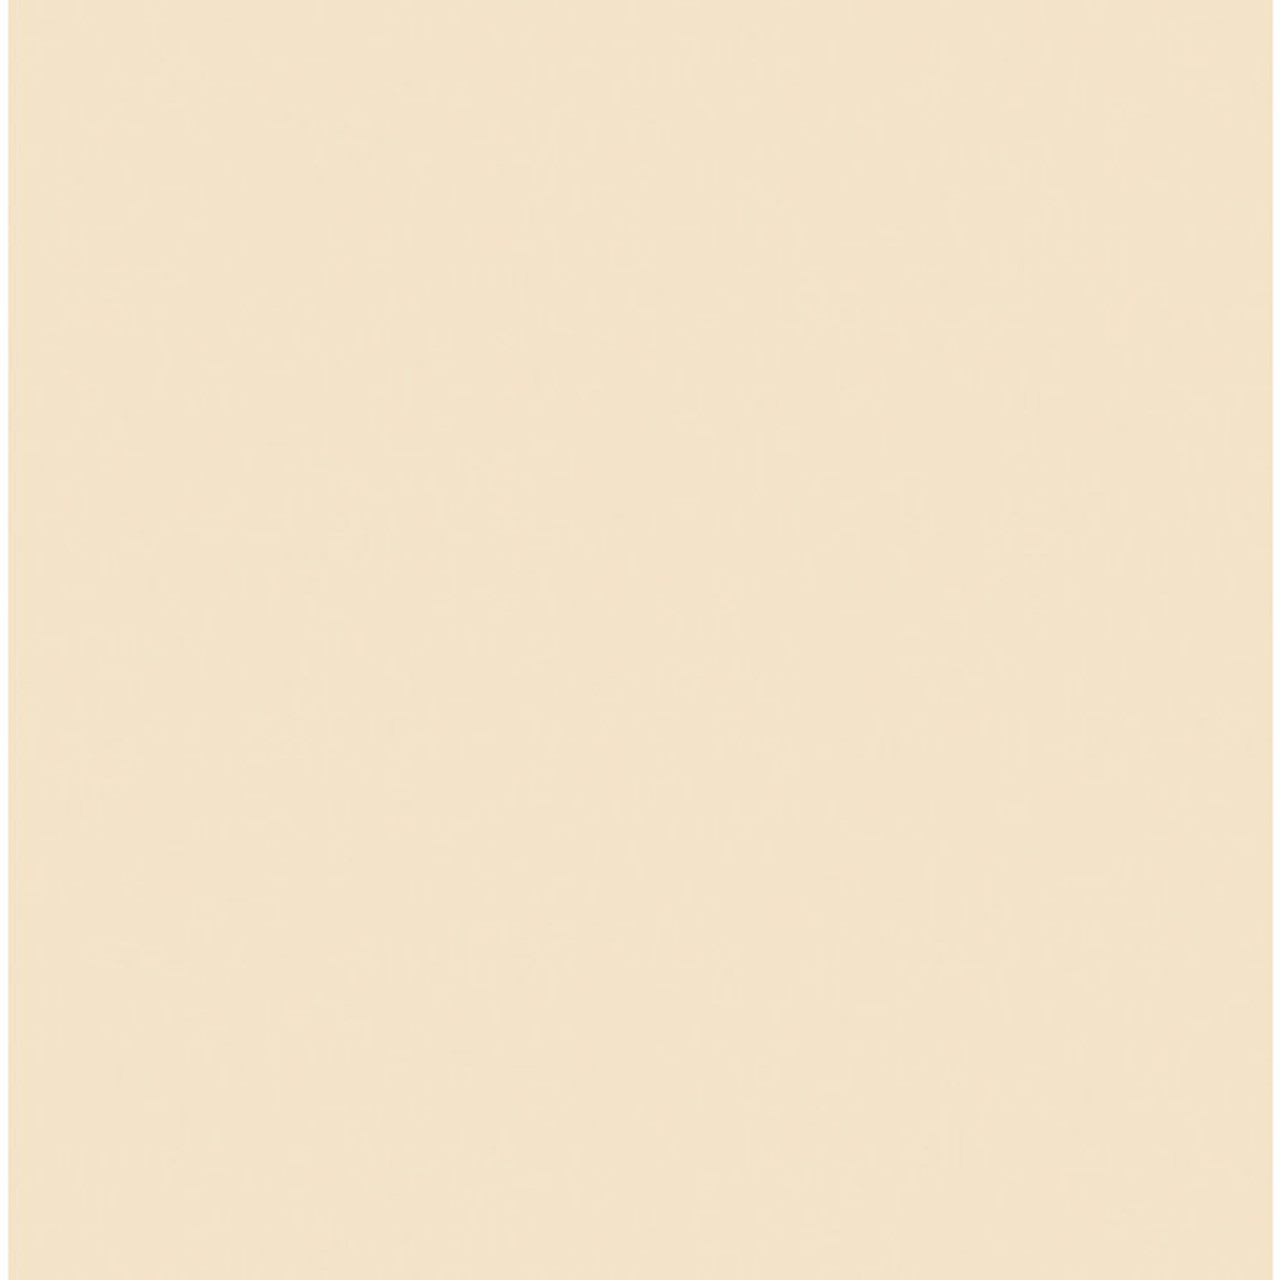 "#3443 Rosco Gels Roscolux Quarter Straw (1/4 CTS), 20x24"""